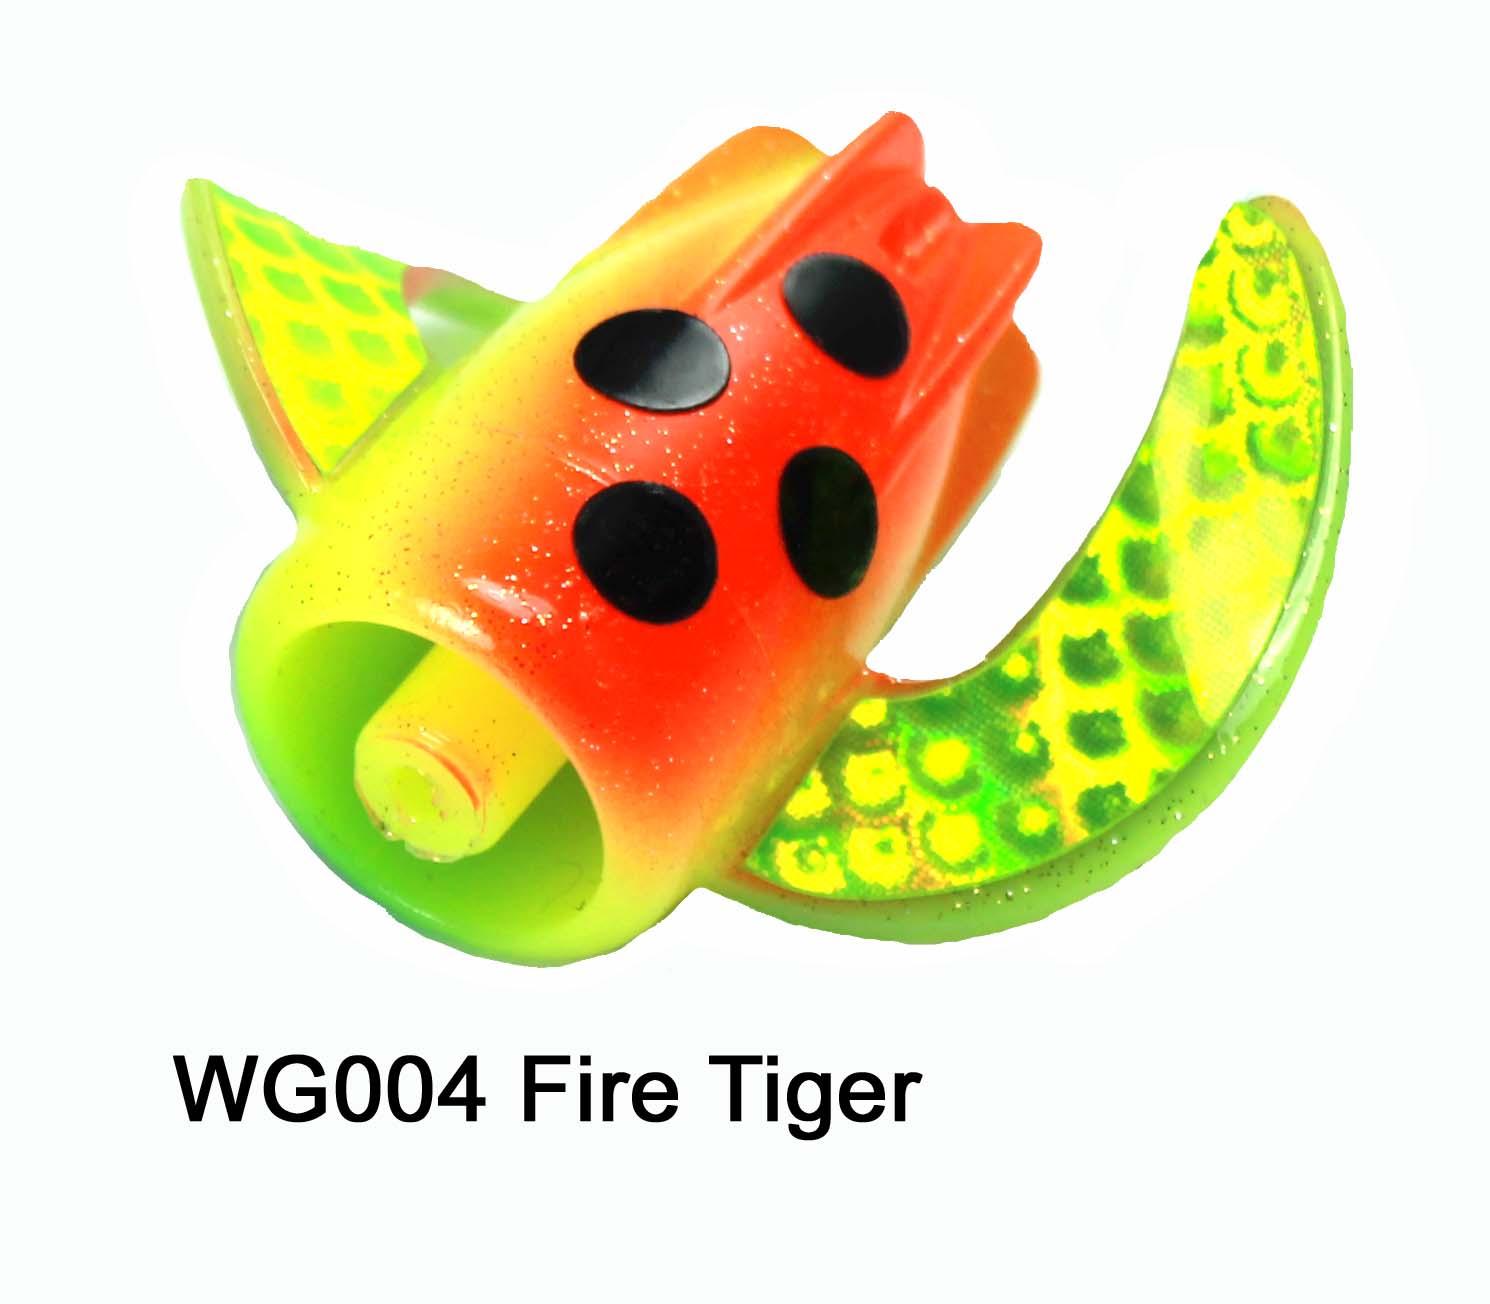 WG004 WhirlyGig Fire Tiger